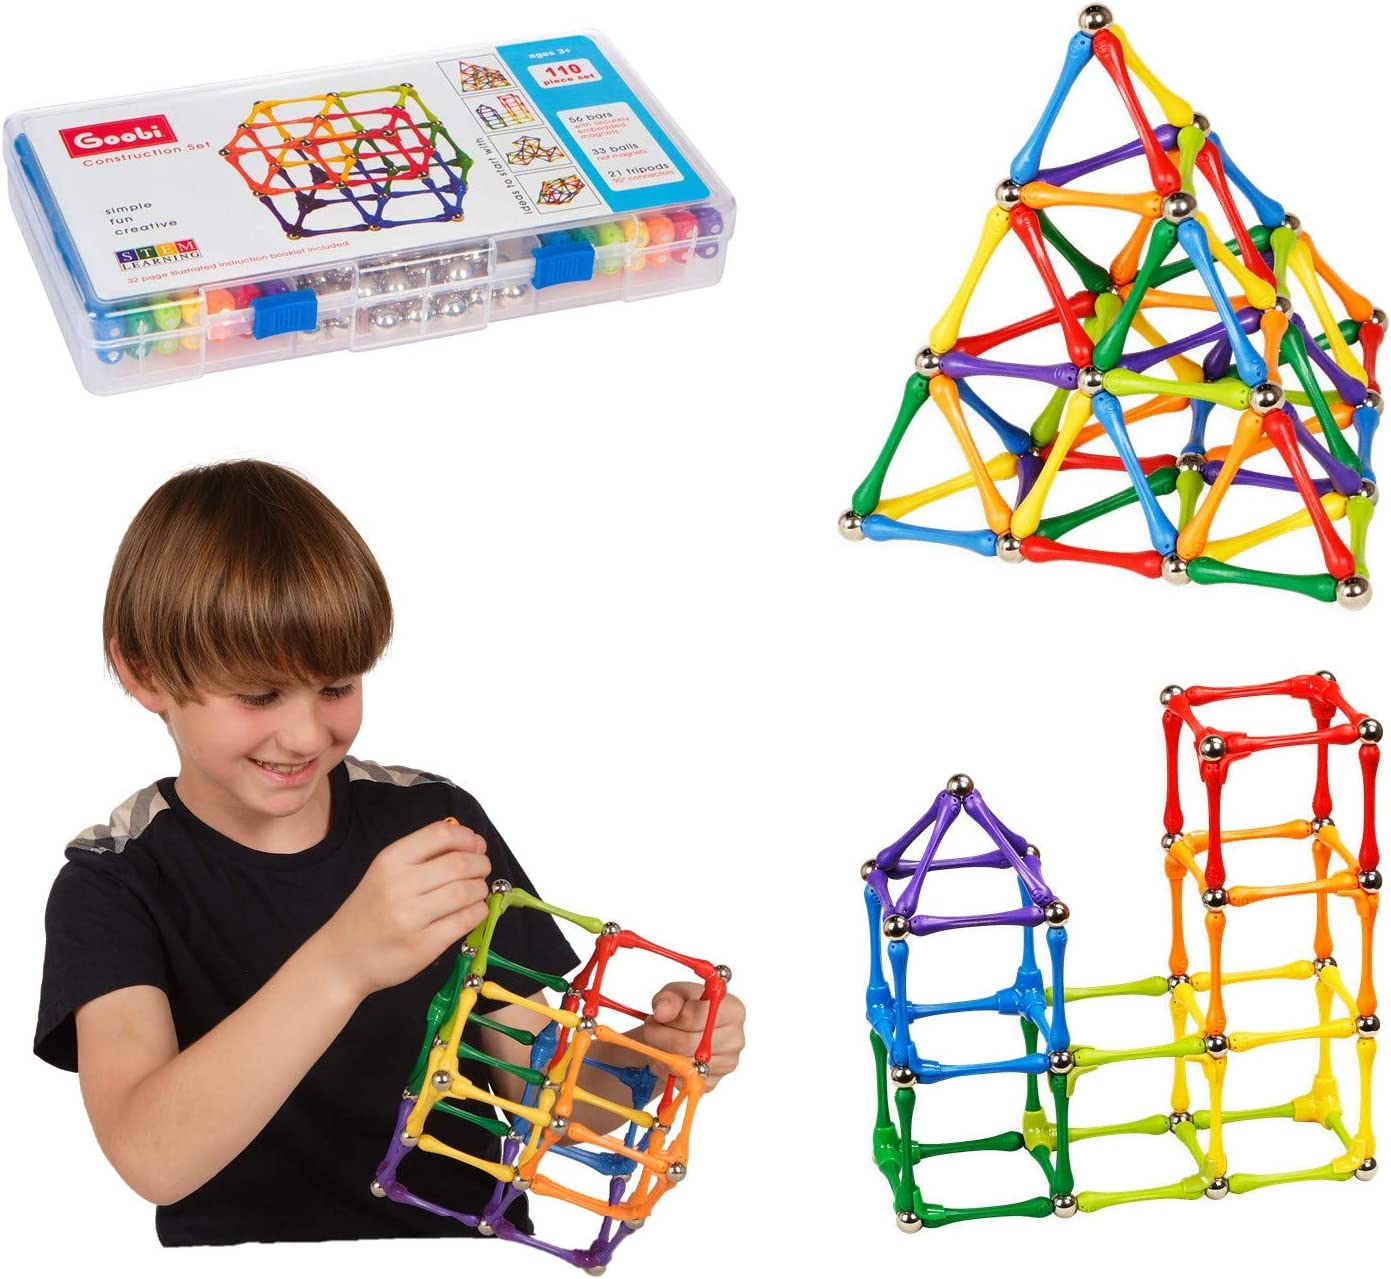 1 year warranty Goobi 110 Piece Construction Set Toy Active Play Building Max 85% OFF Sticks